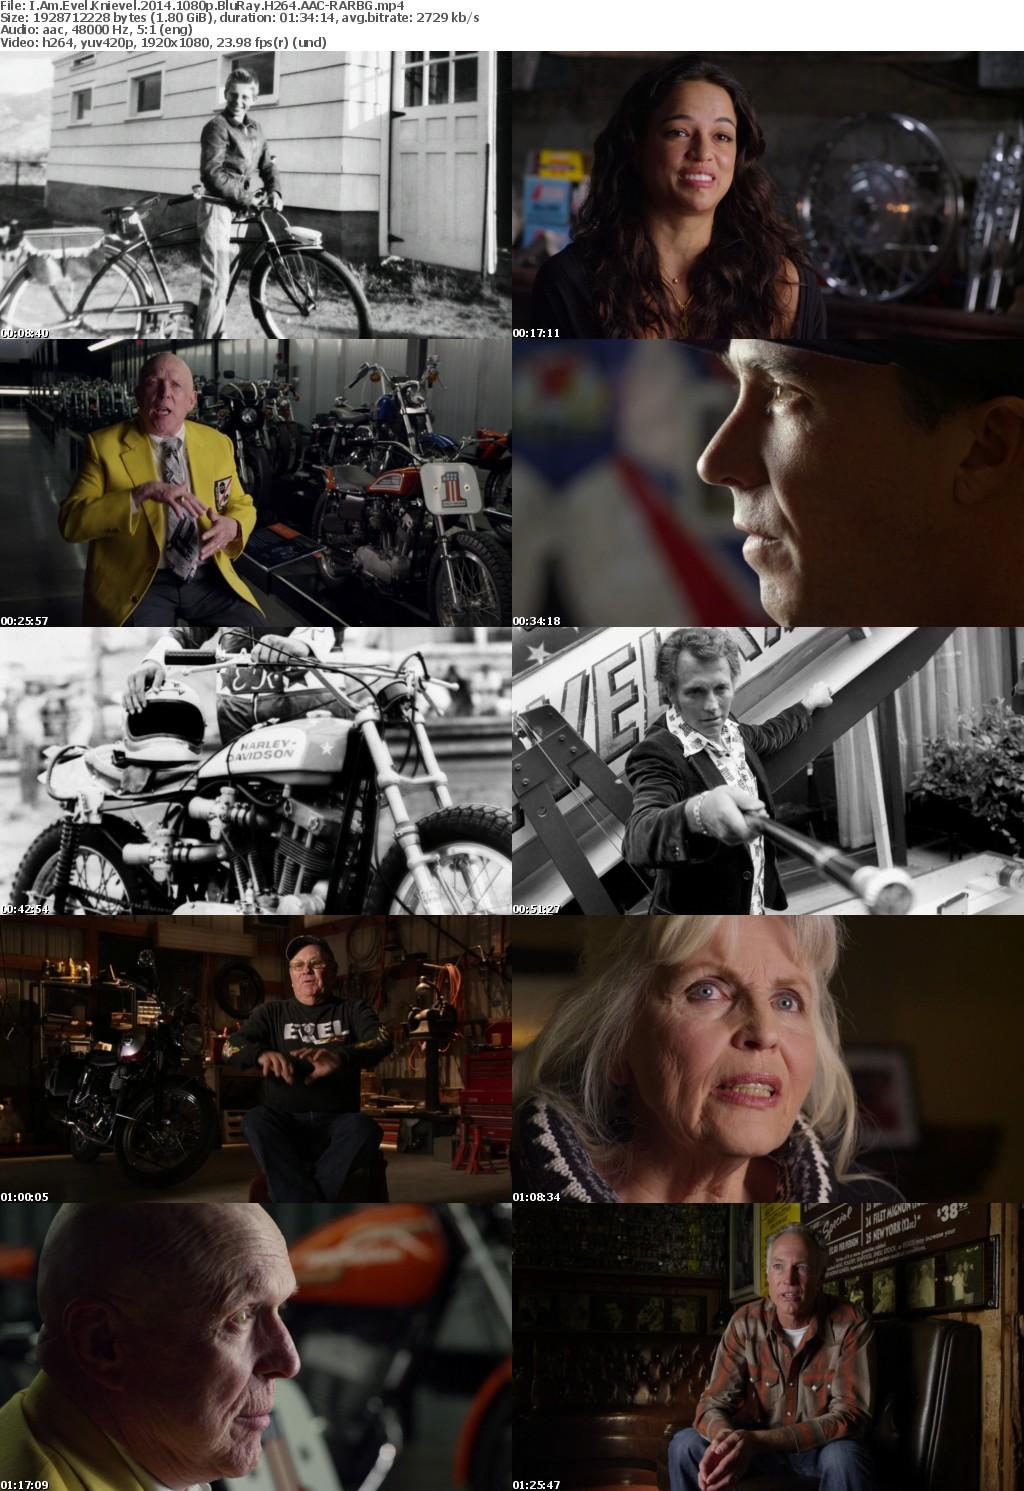 I Am Evel Knievel (2014) 1080p BluRay H264 AAC-RARBG